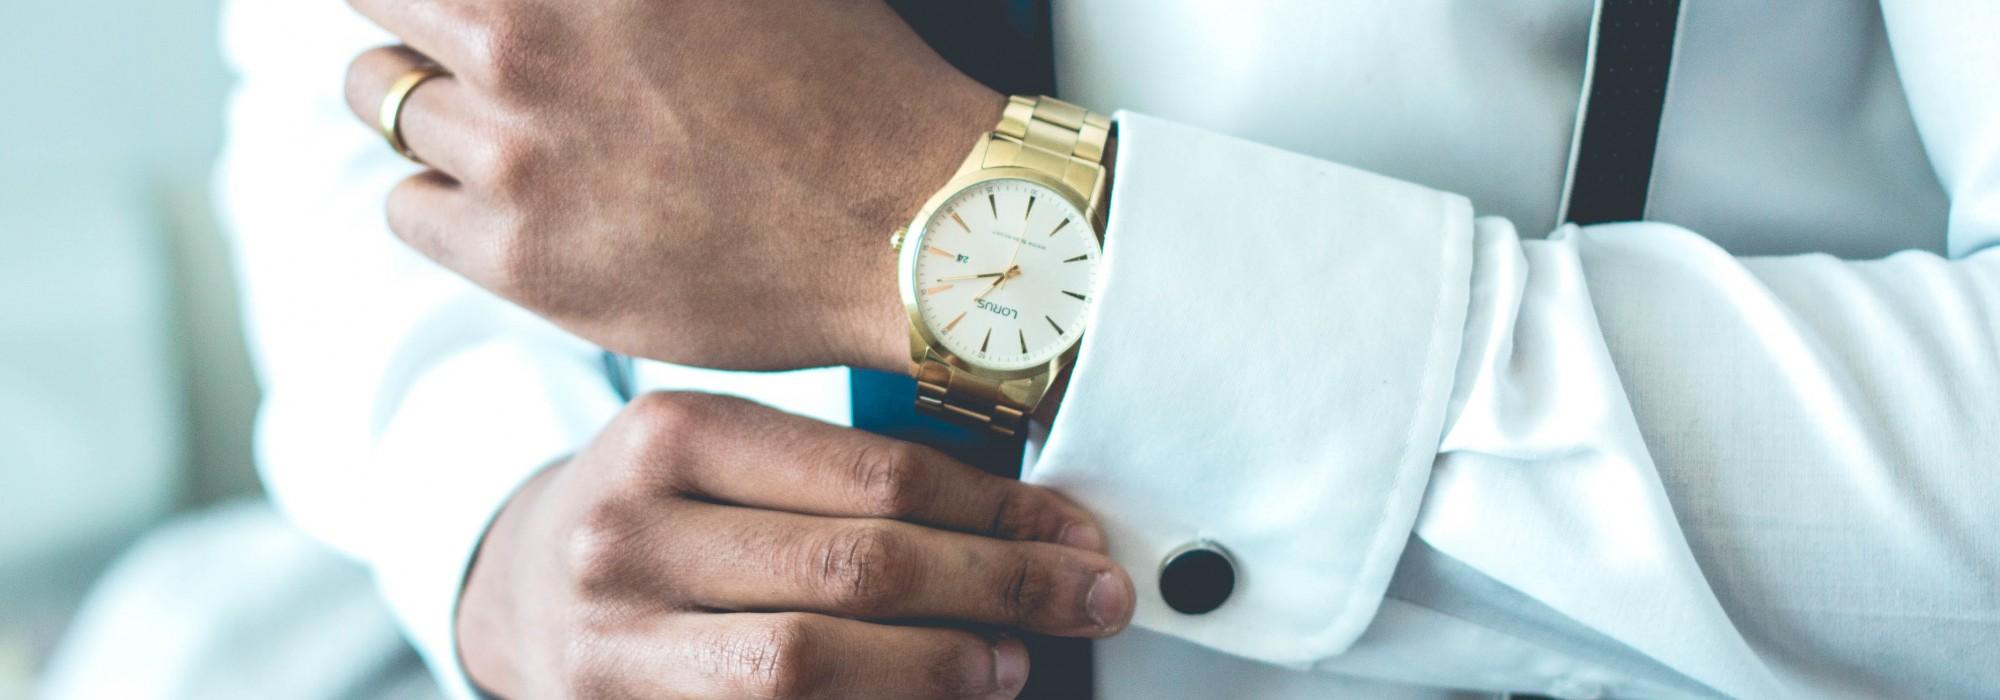 Uhr an Handgelenk